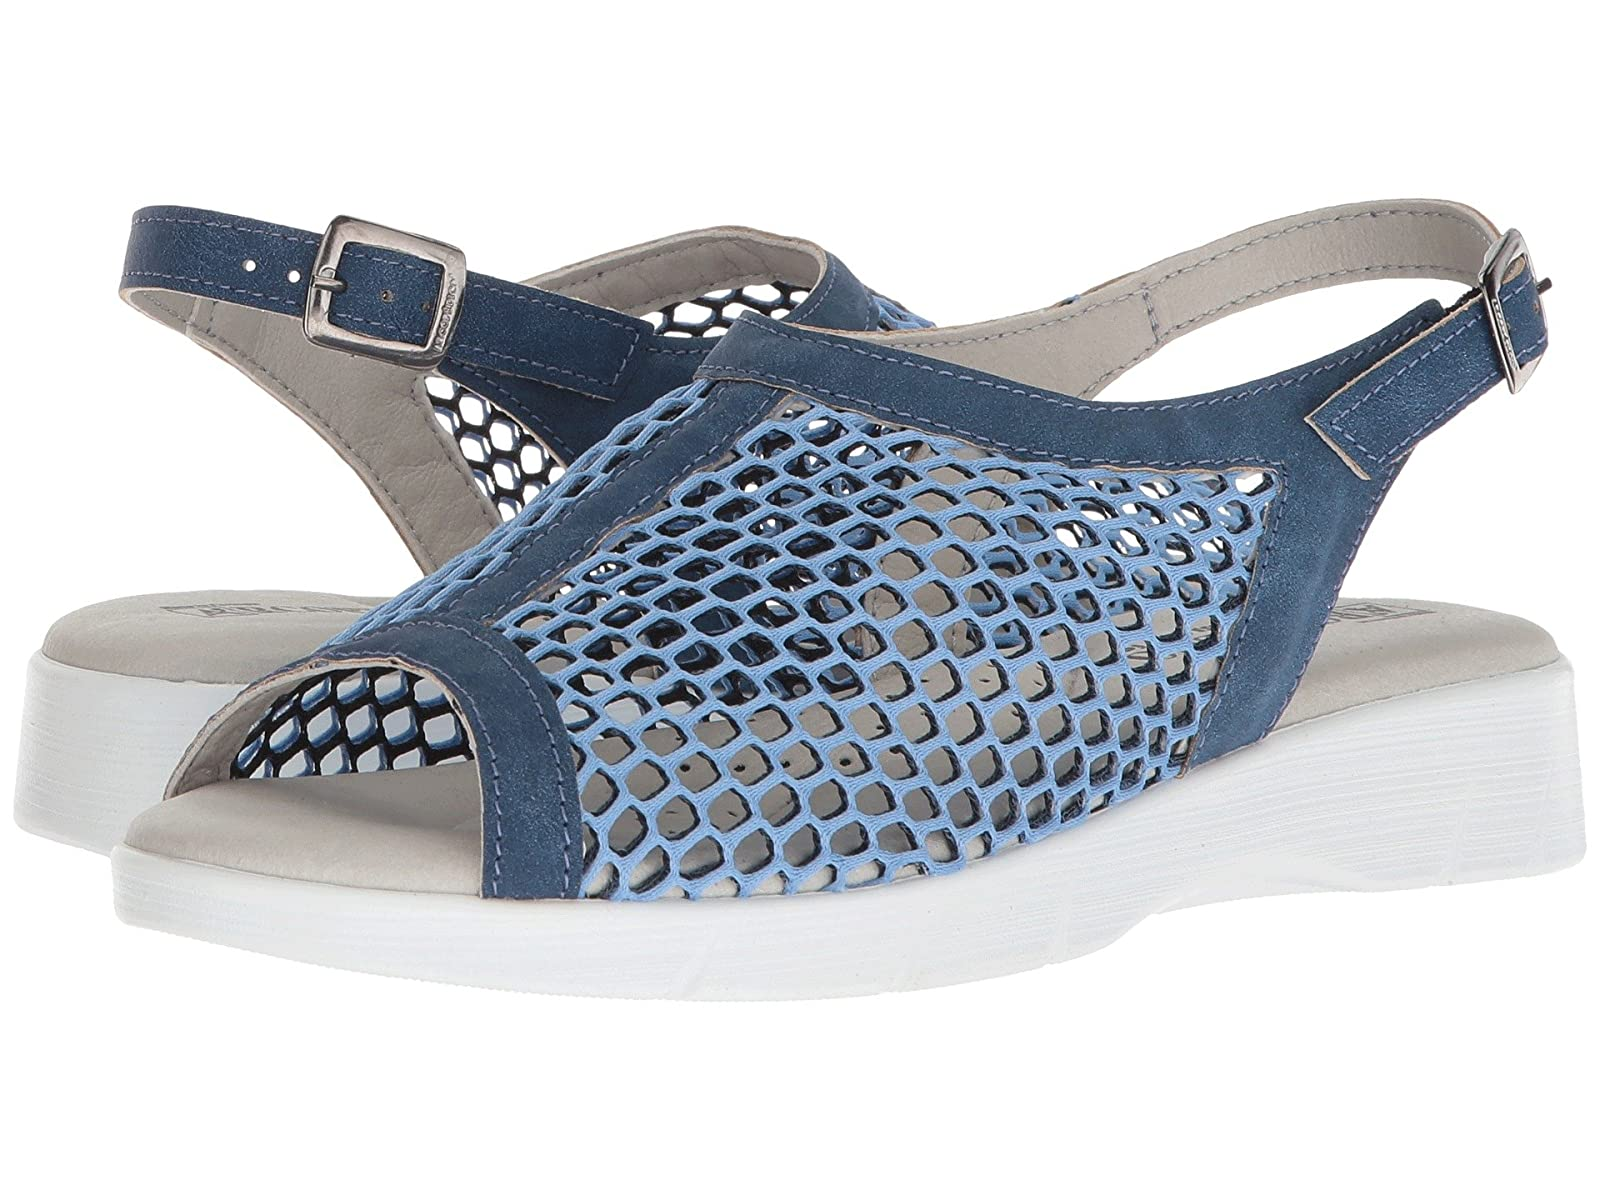 Arcopedico AntaliaComfortable and distinctive shoes